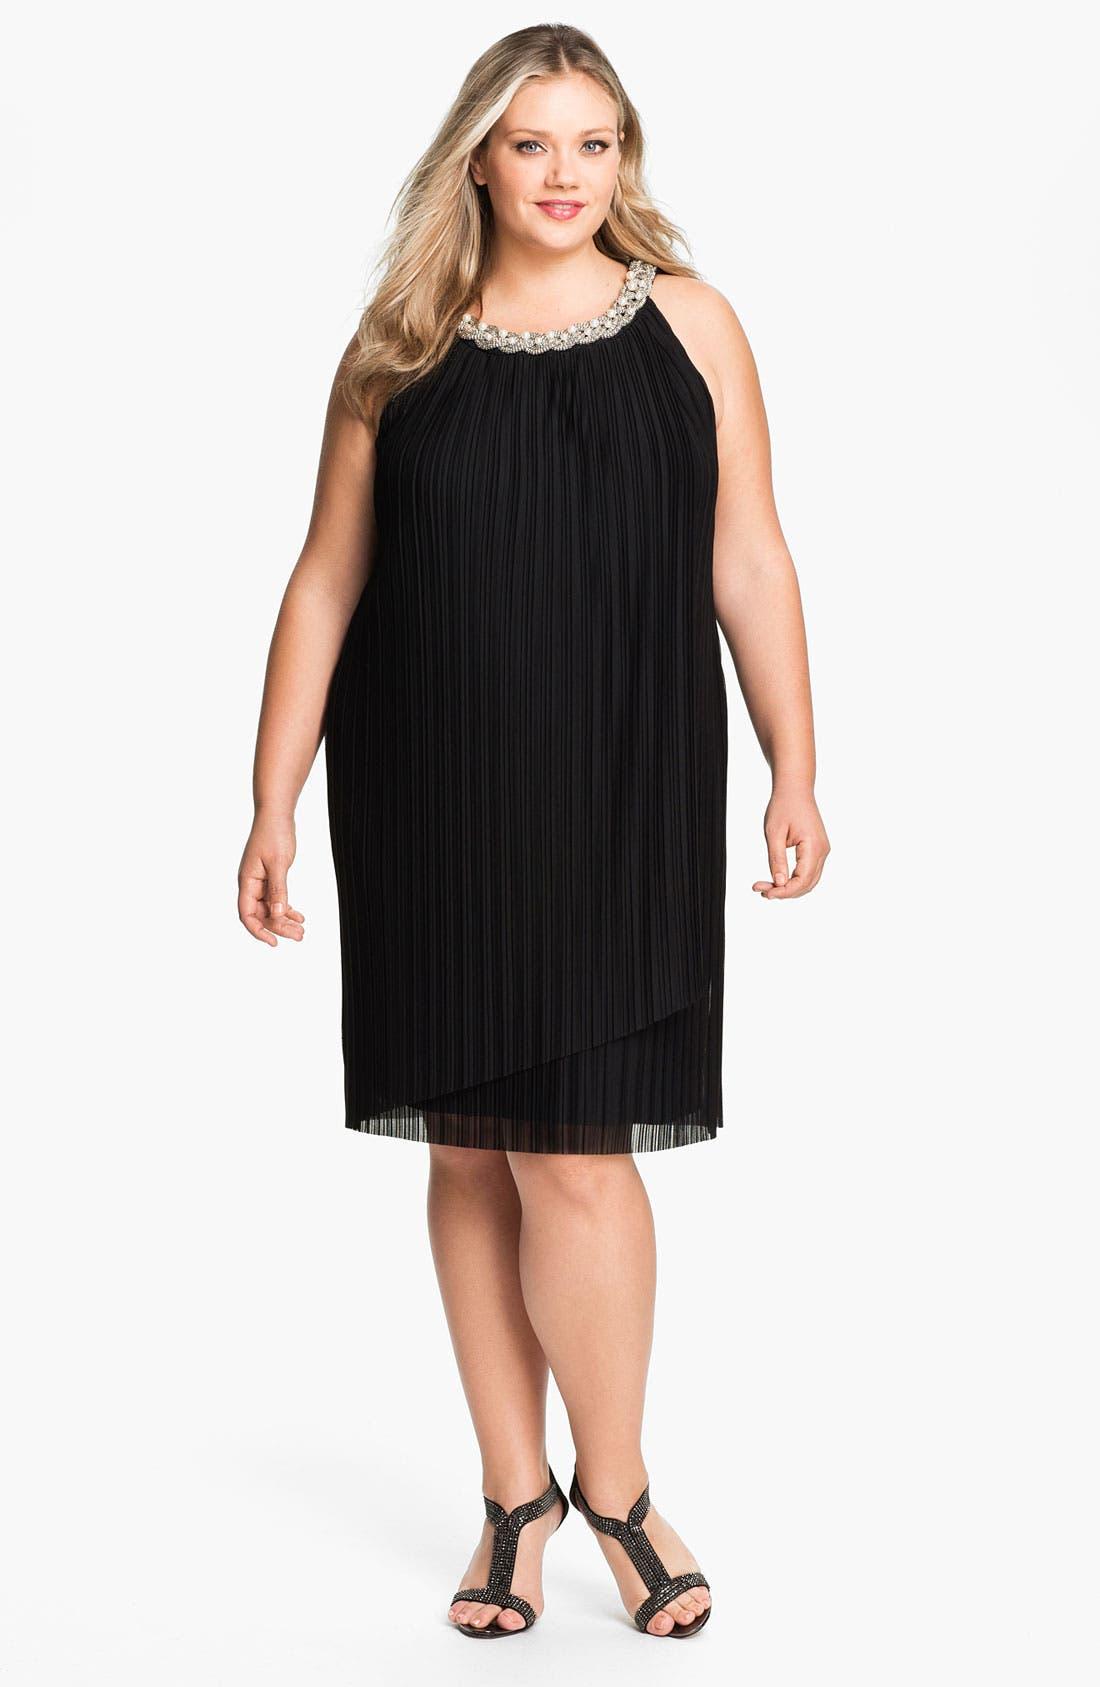 Alternate Image 1 Selected - Donna Ricco Embellished Pleat Mesh Shift Dress (Plus Size)